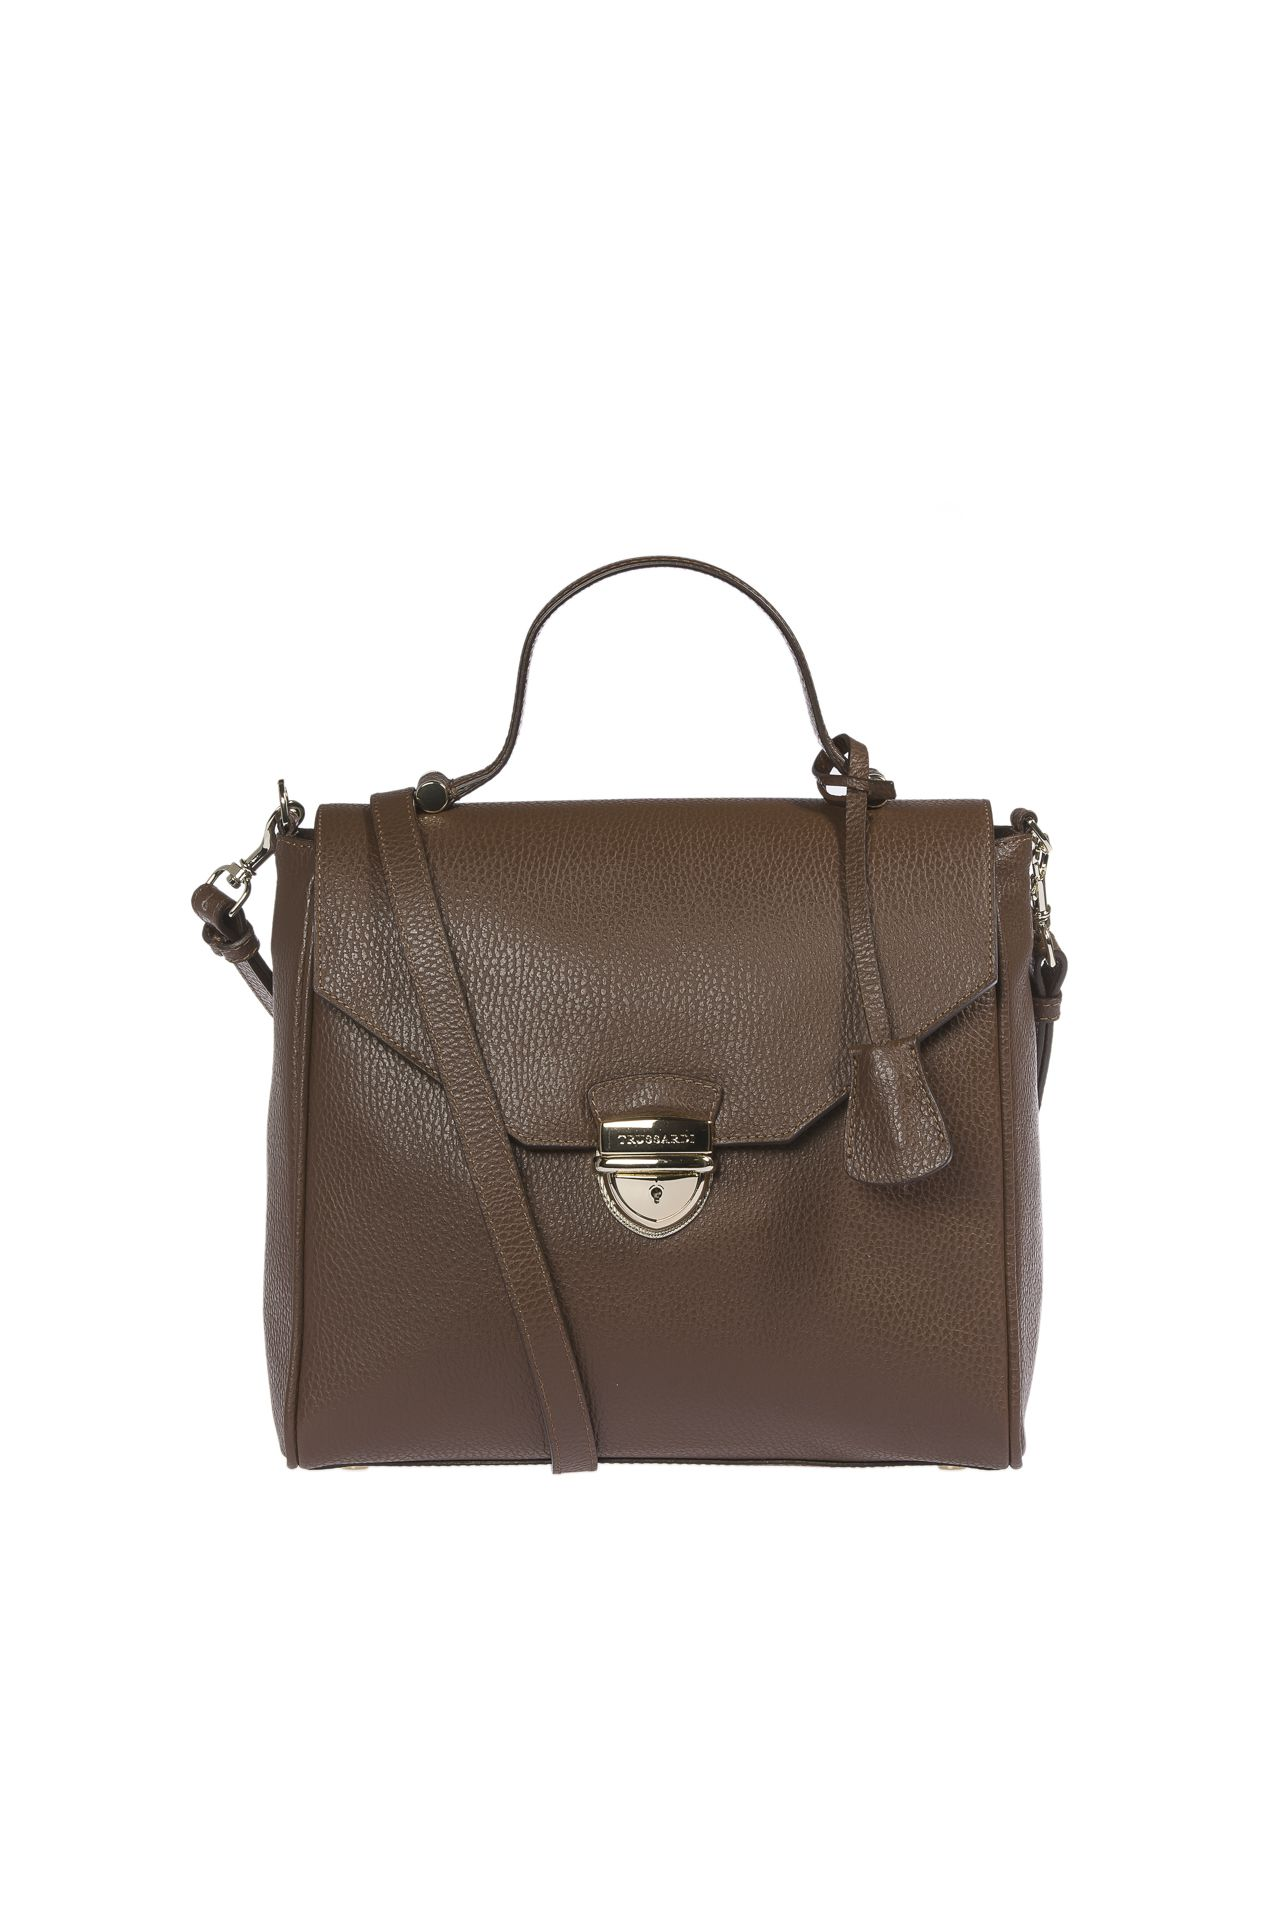 Trussardi Women's Handbag Brown 1DB548_69DarkBrown